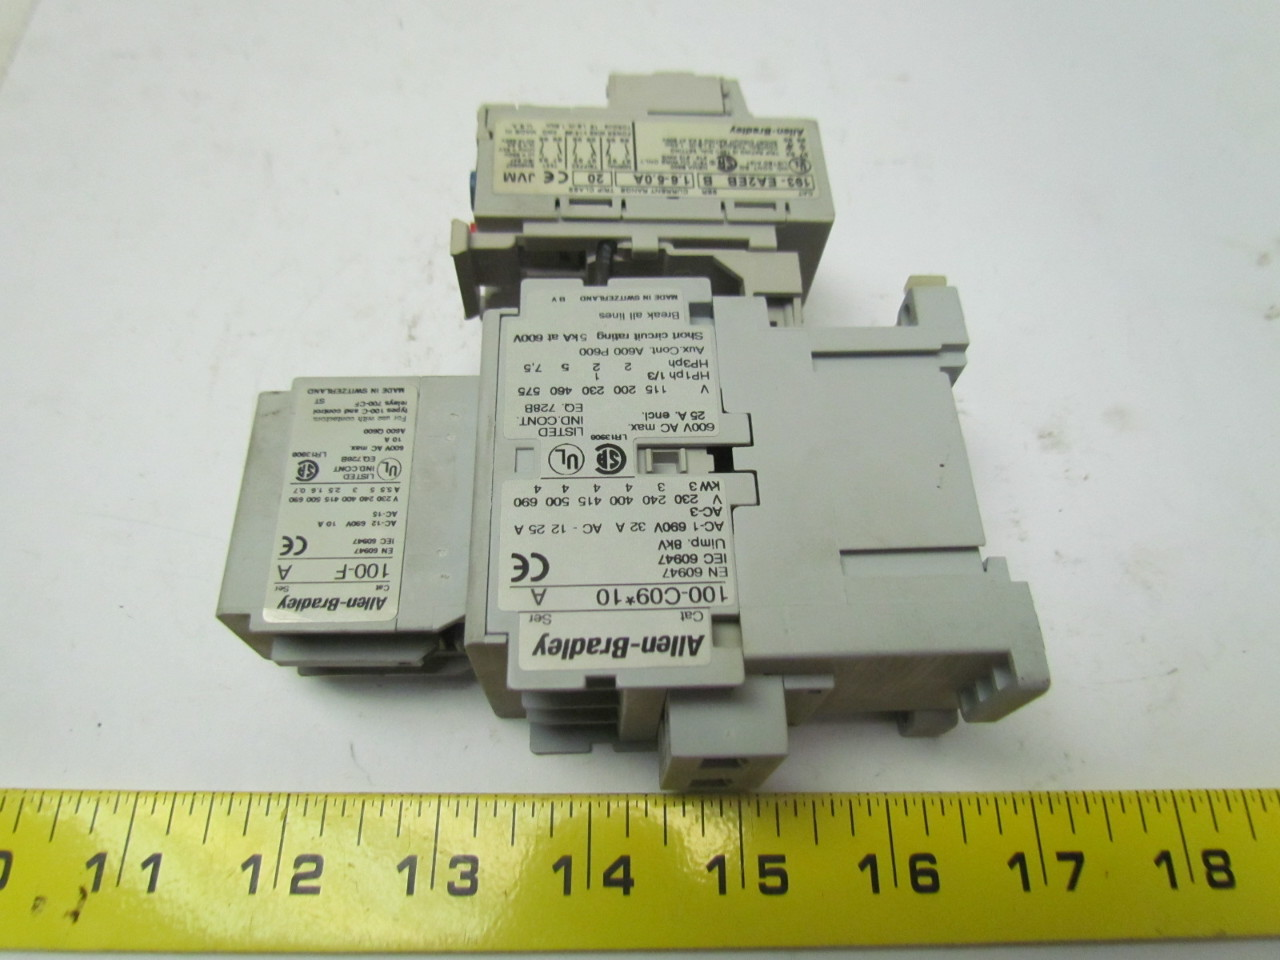 wiring diagram for contactor and overload dometic rv fridge allen bradley 100 c09 10 3 pole w 193 ea2eb